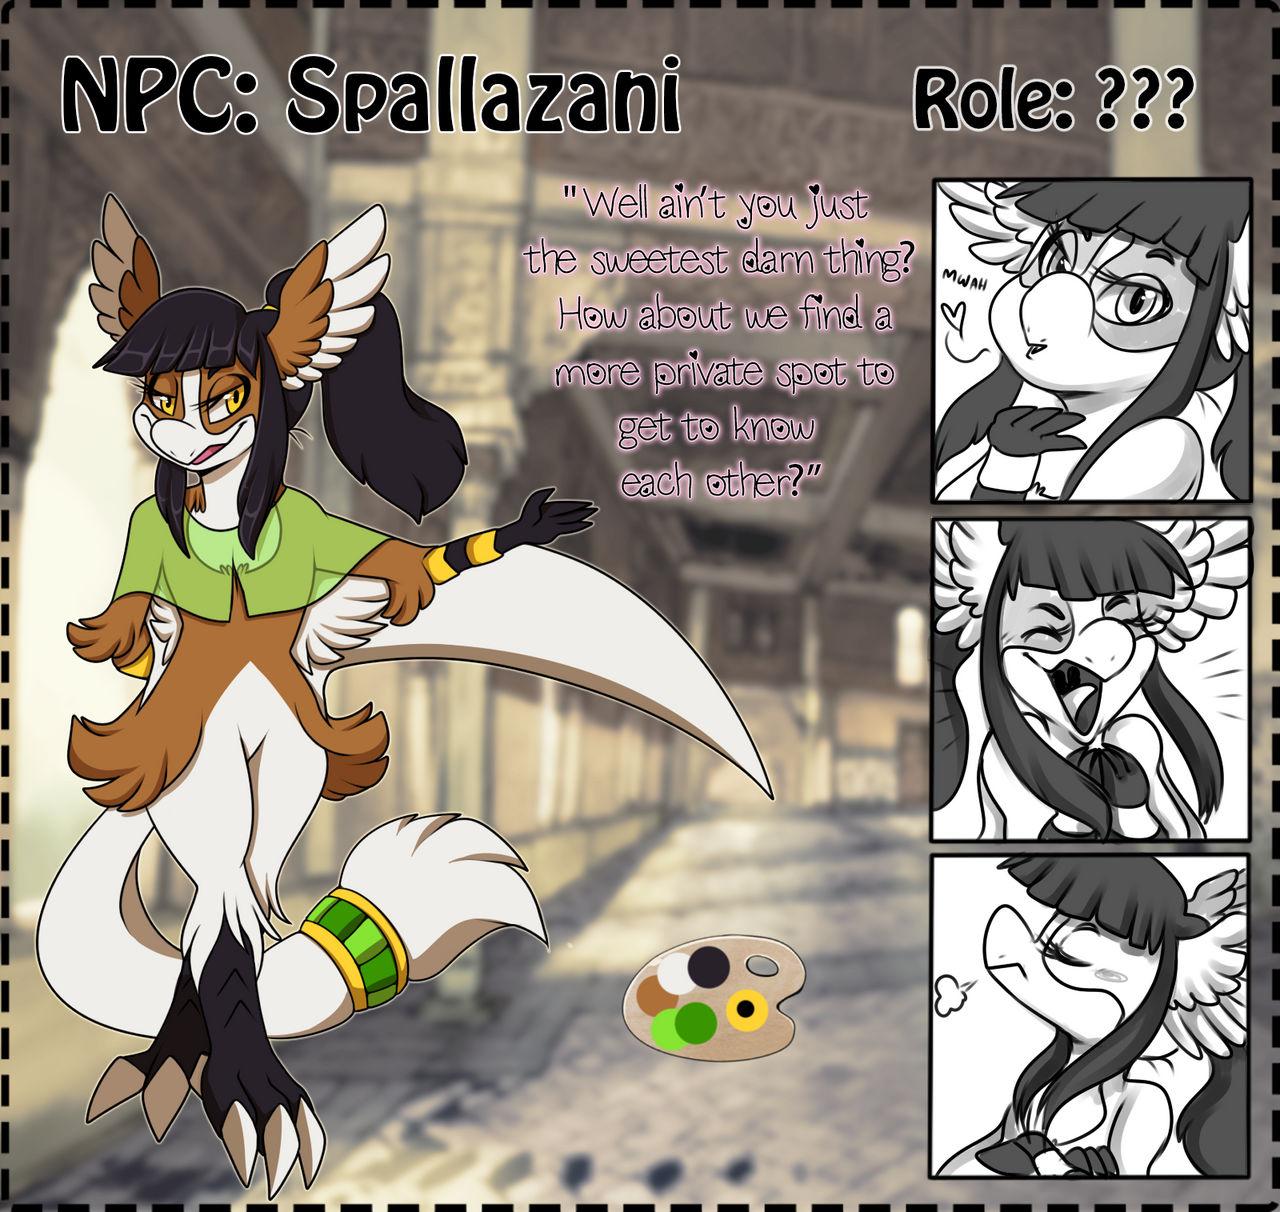 NPC: Spallazani